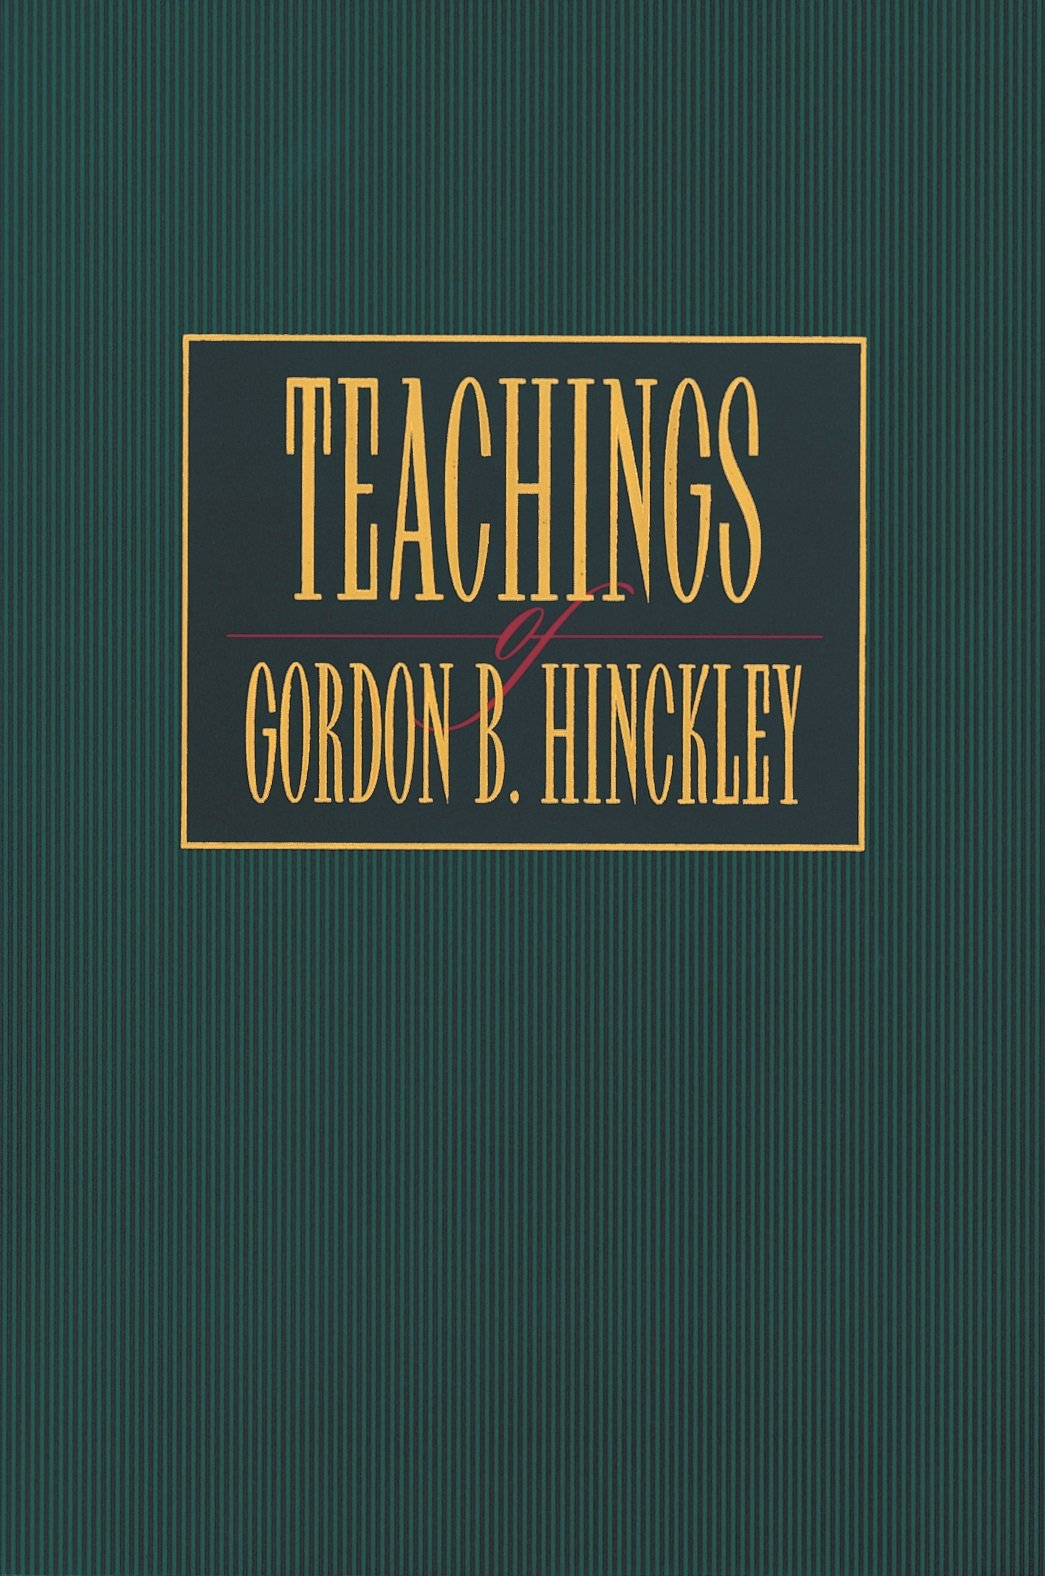 teachings of gordon b hinckley gordon b hinckley